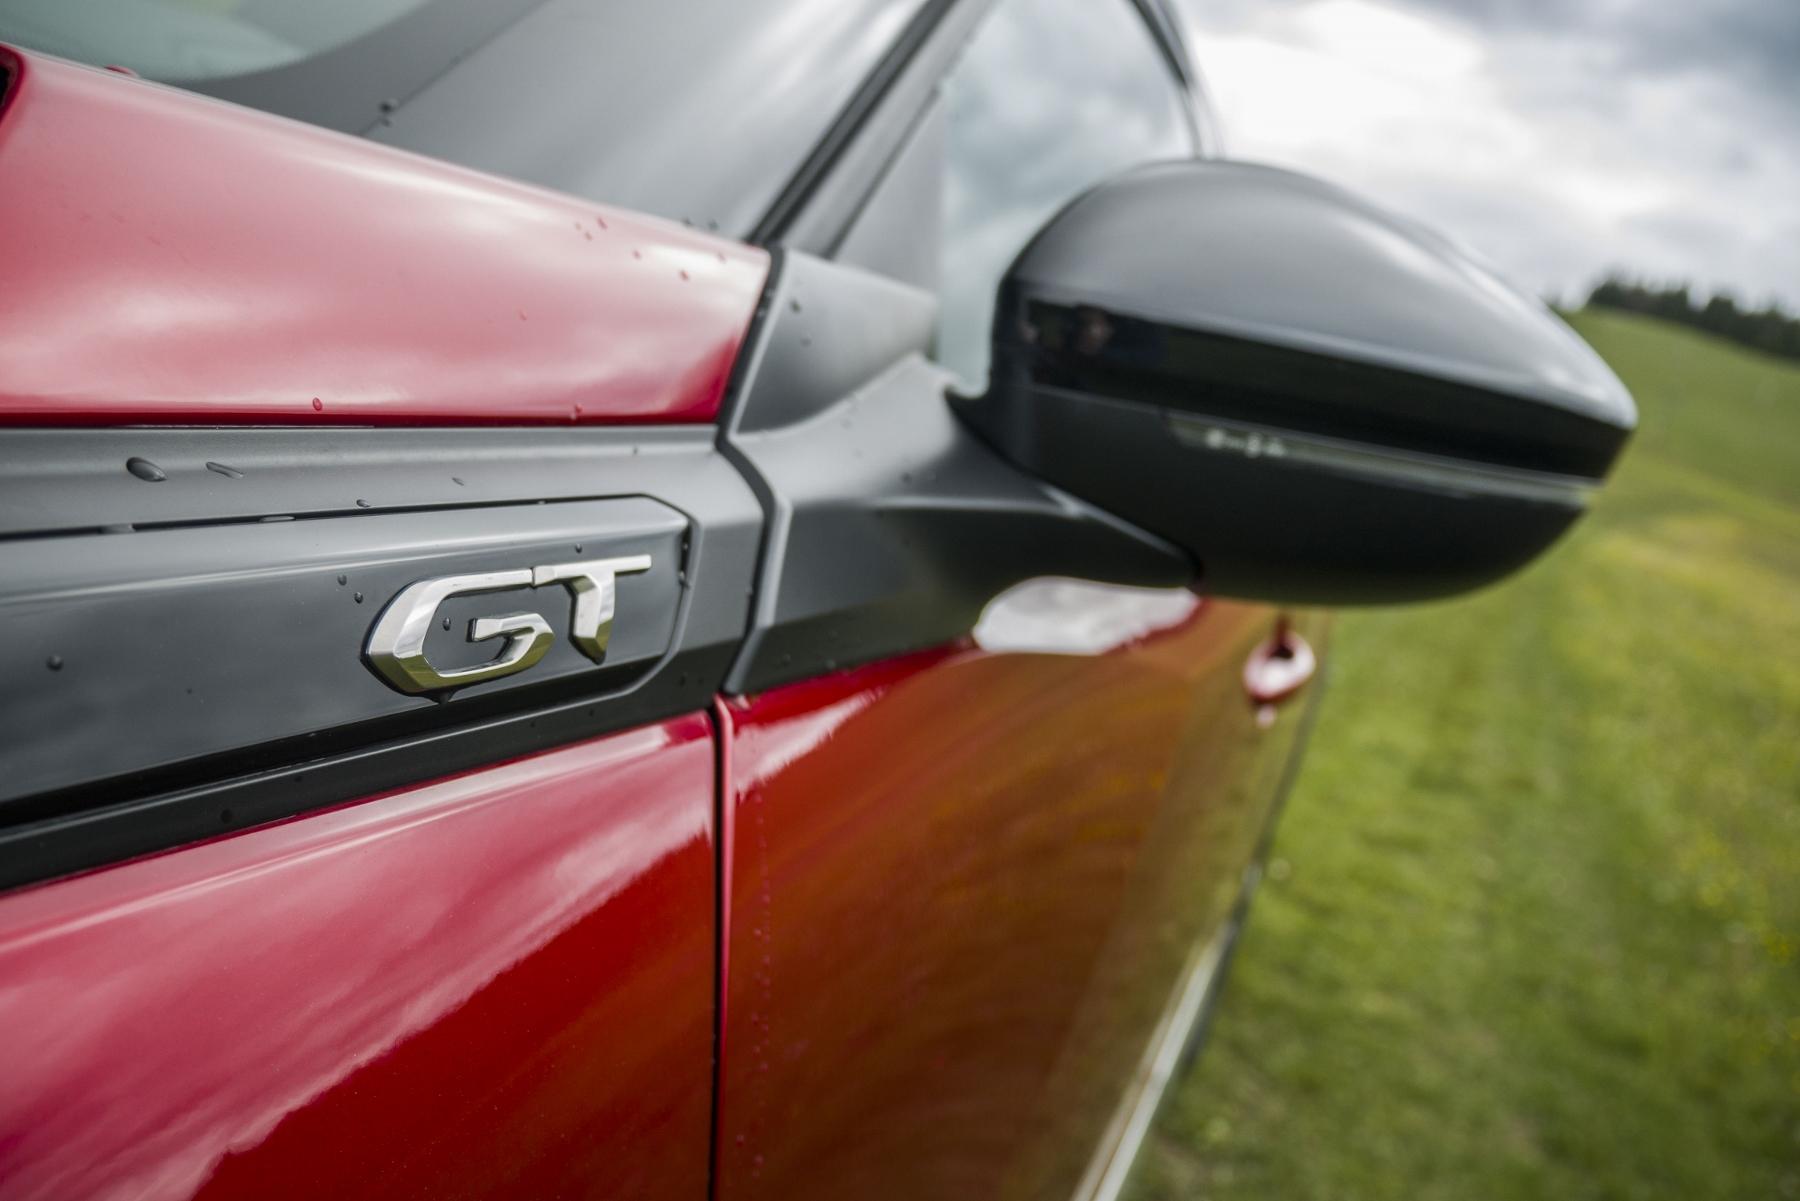 Test: Peugeot 2008 GT ohuruje silným trojvalcom a dobrou prevodovkou W6Q9M3H6r9 peugeot-2008-40